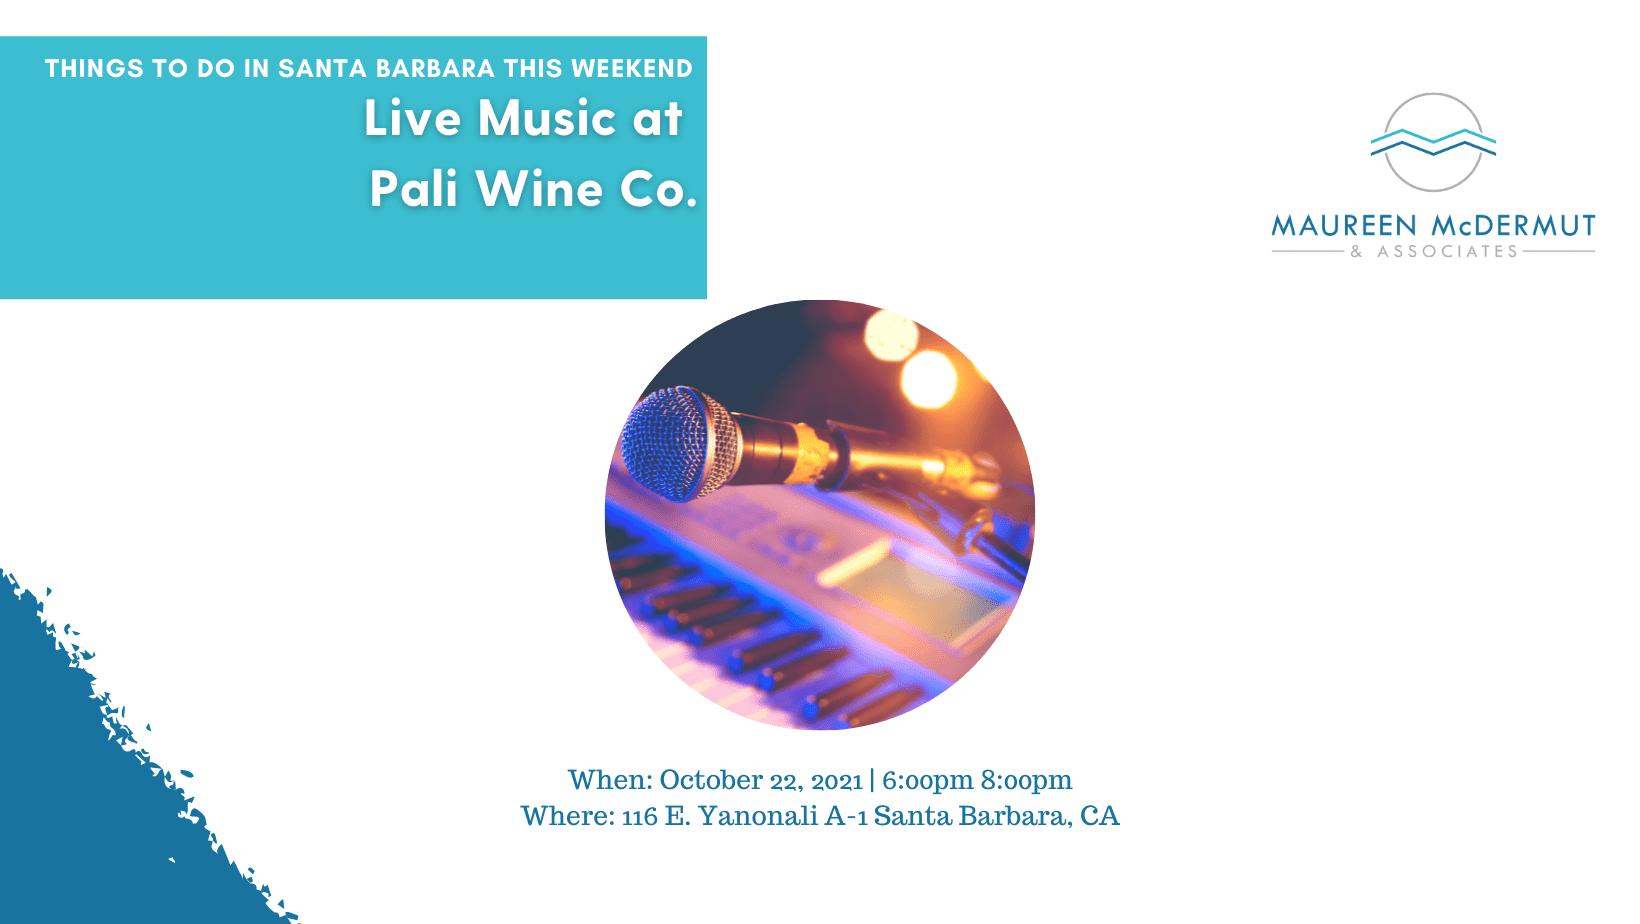 Live Music at Pali Wine Co. image